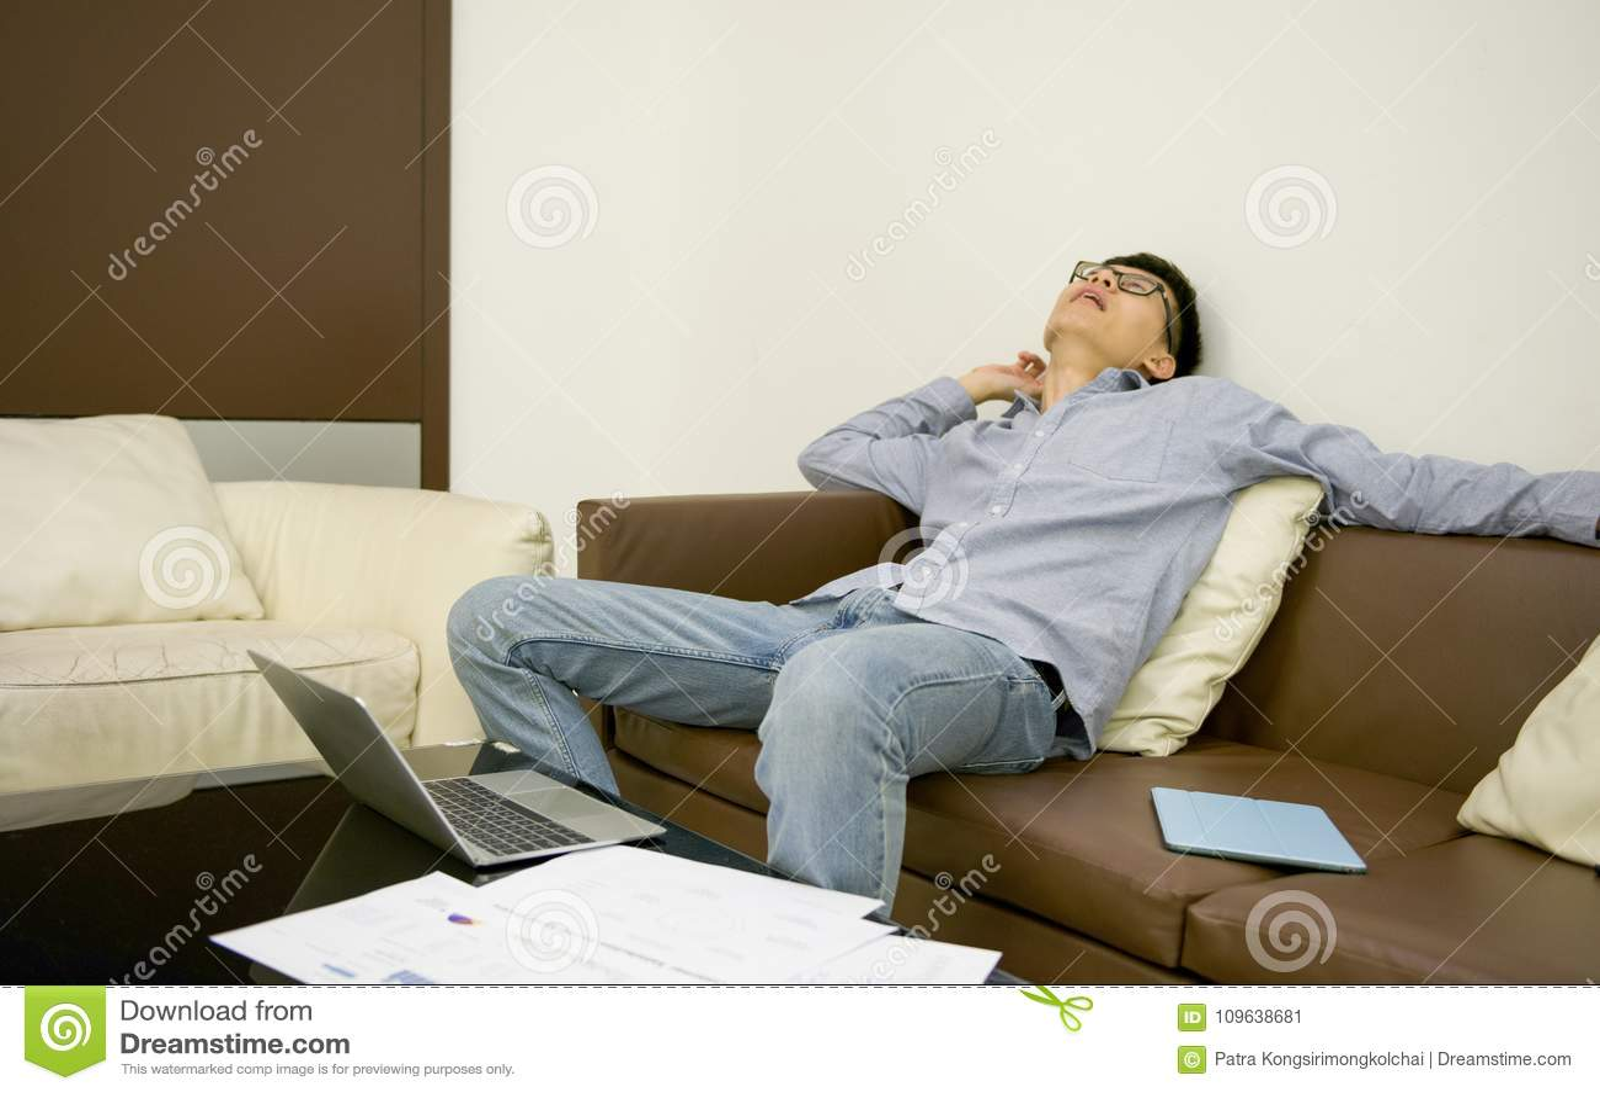 Asian Businessman Sleeping On Sofa In Living Room At Night.